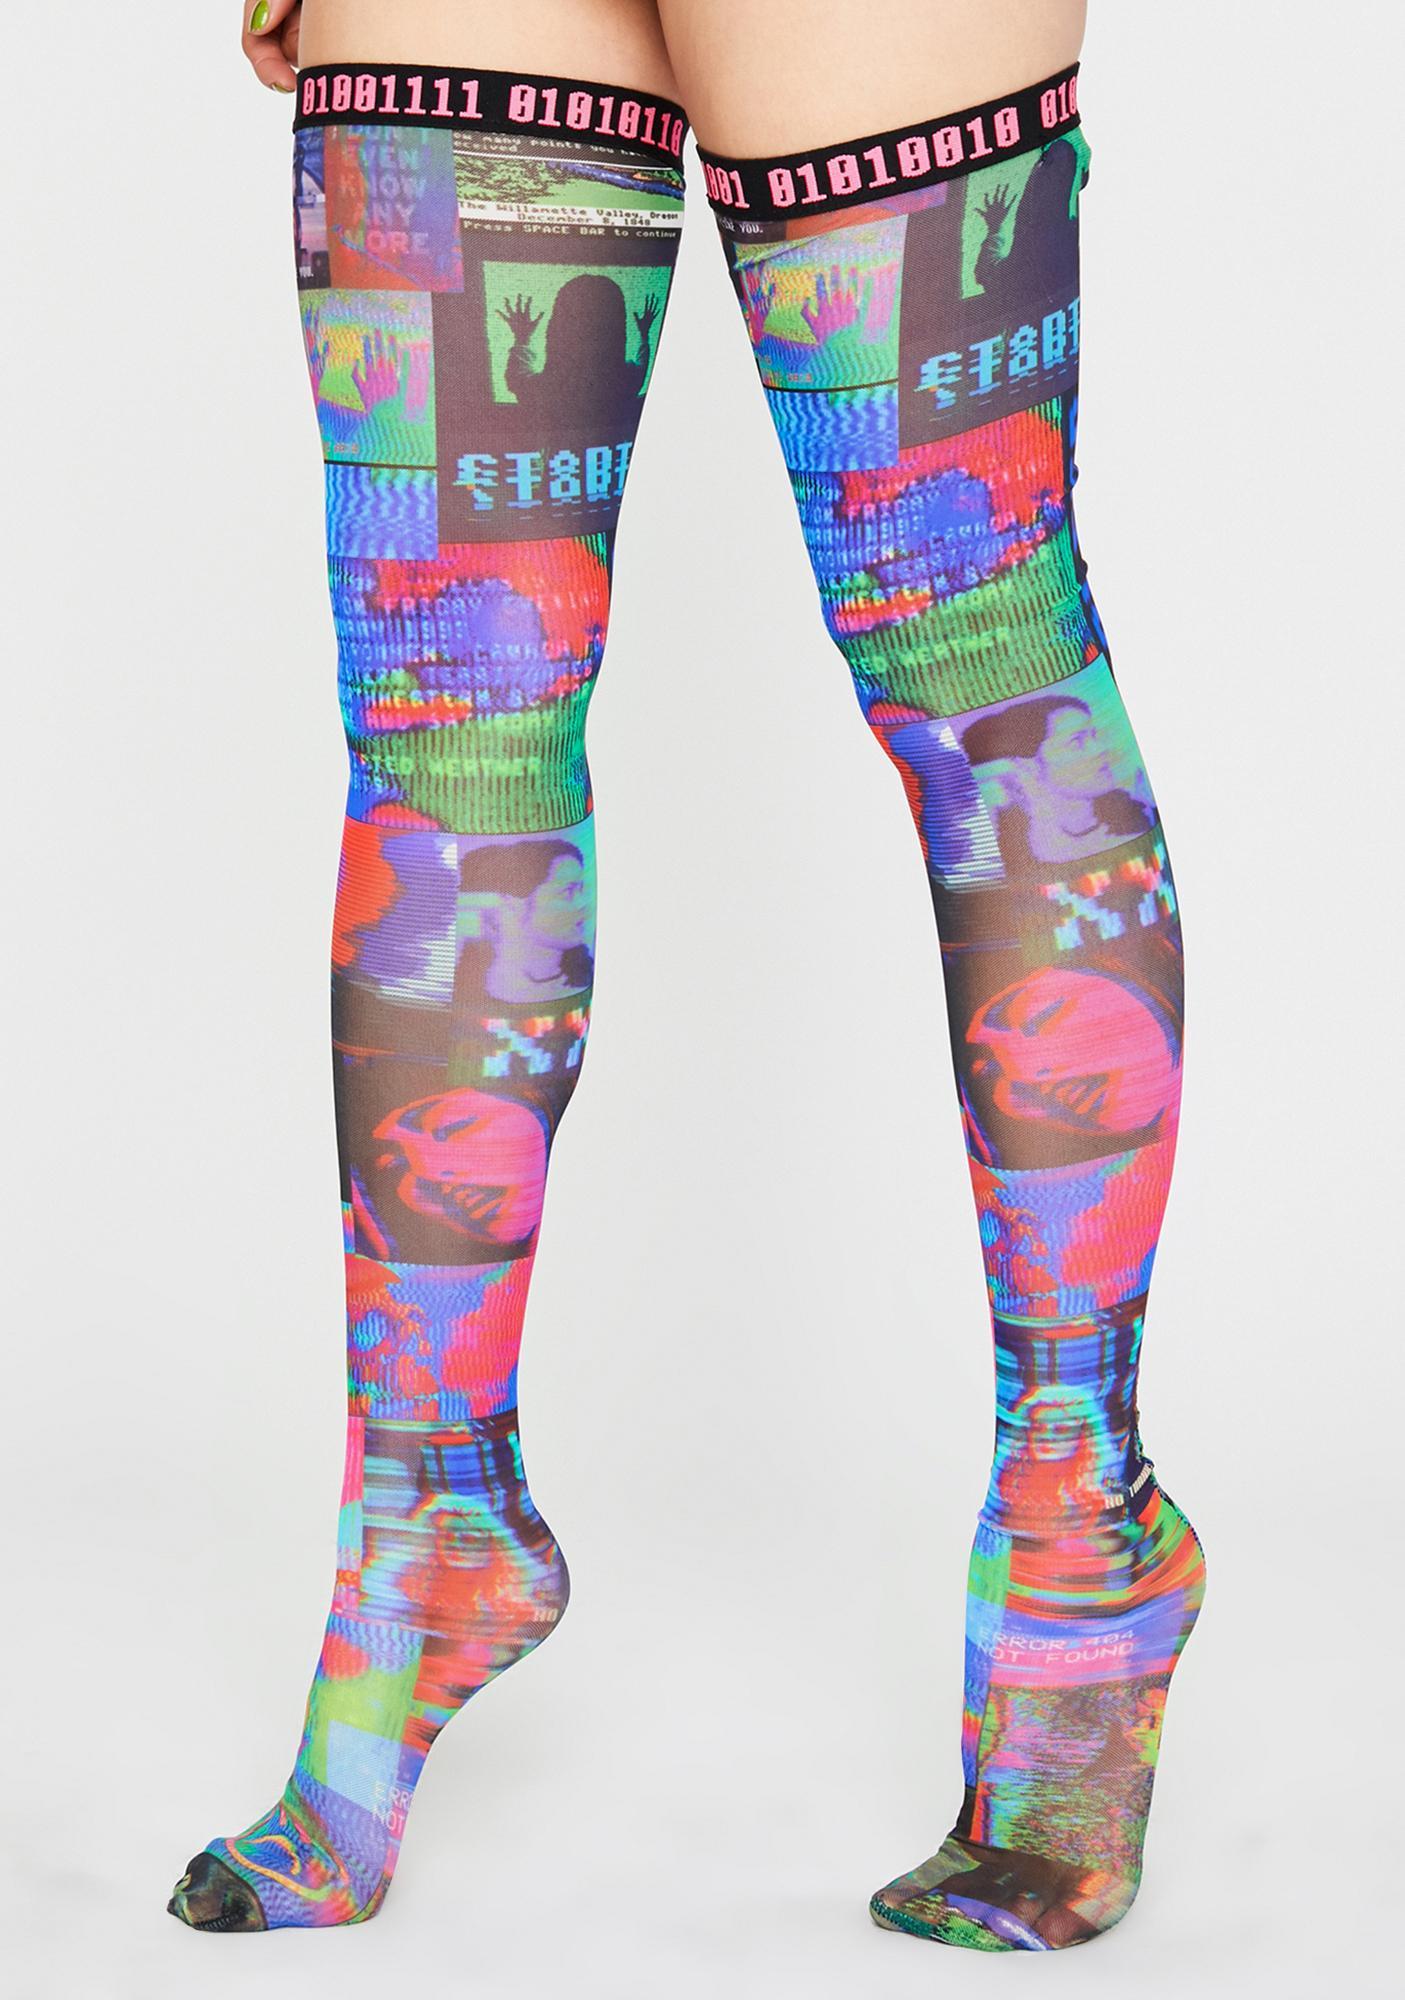 HOROSCOPEZ Human Error Thigh High Socks